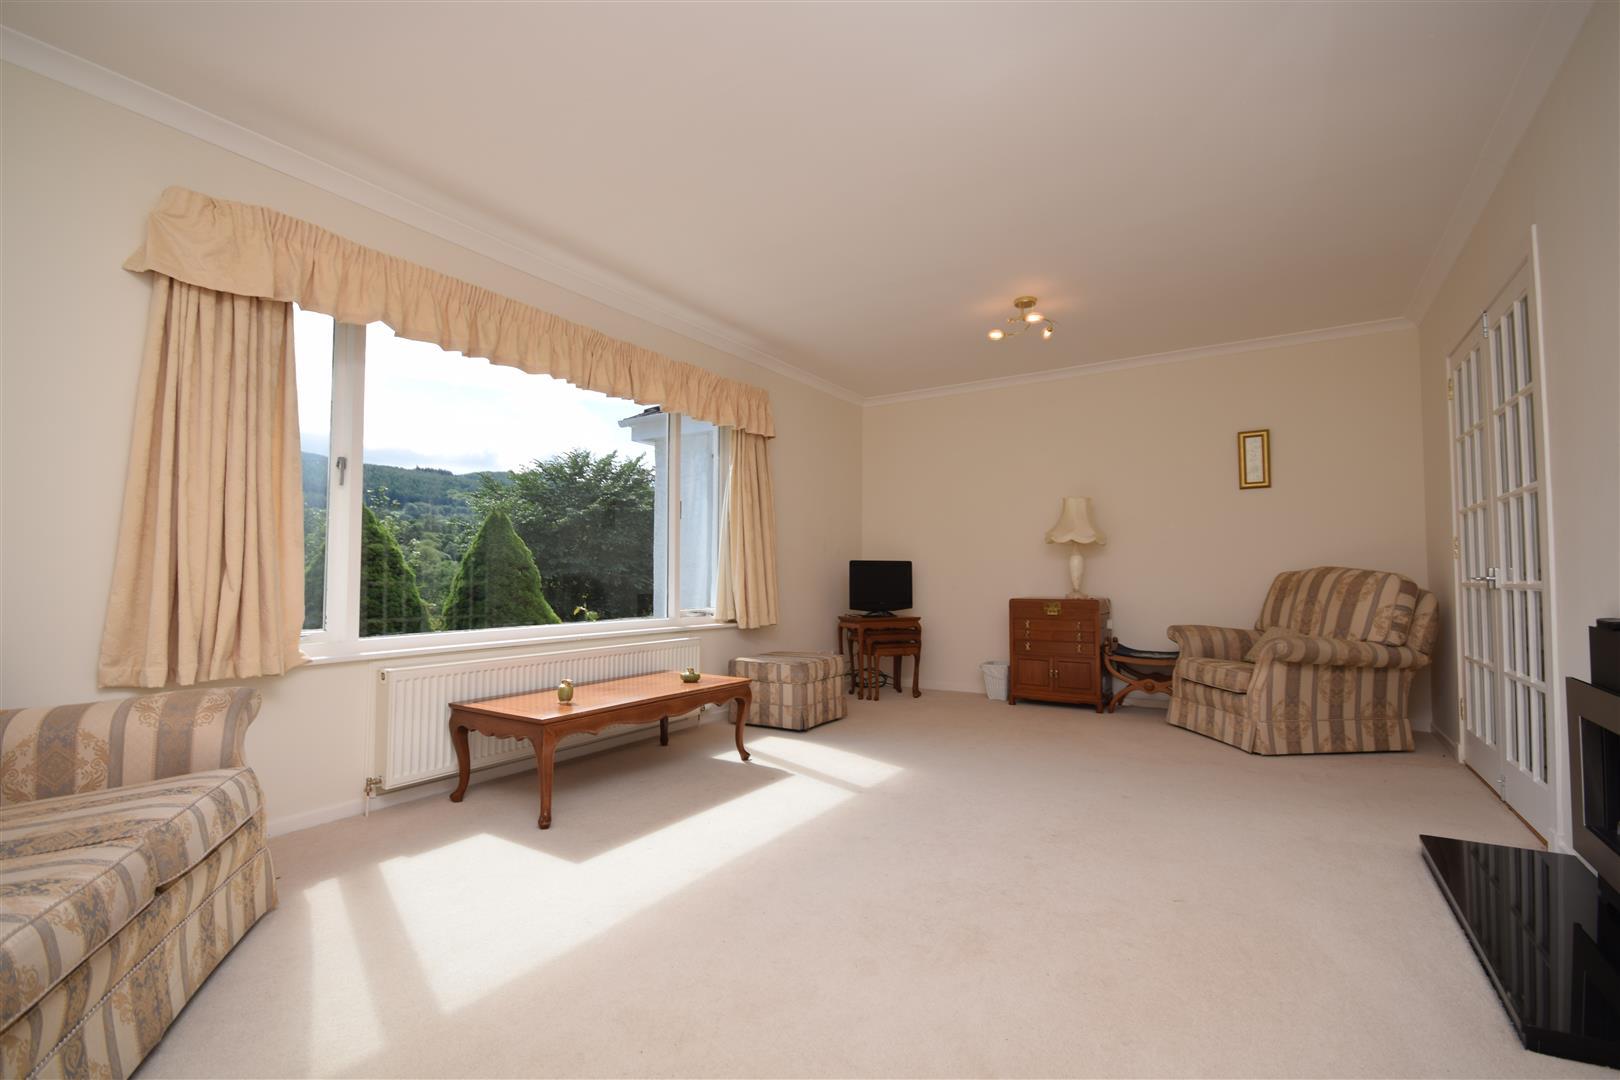 Acorns, 10, Dundarach Gardens, Pitlochry, Perthshire, PH16 5DX, UK